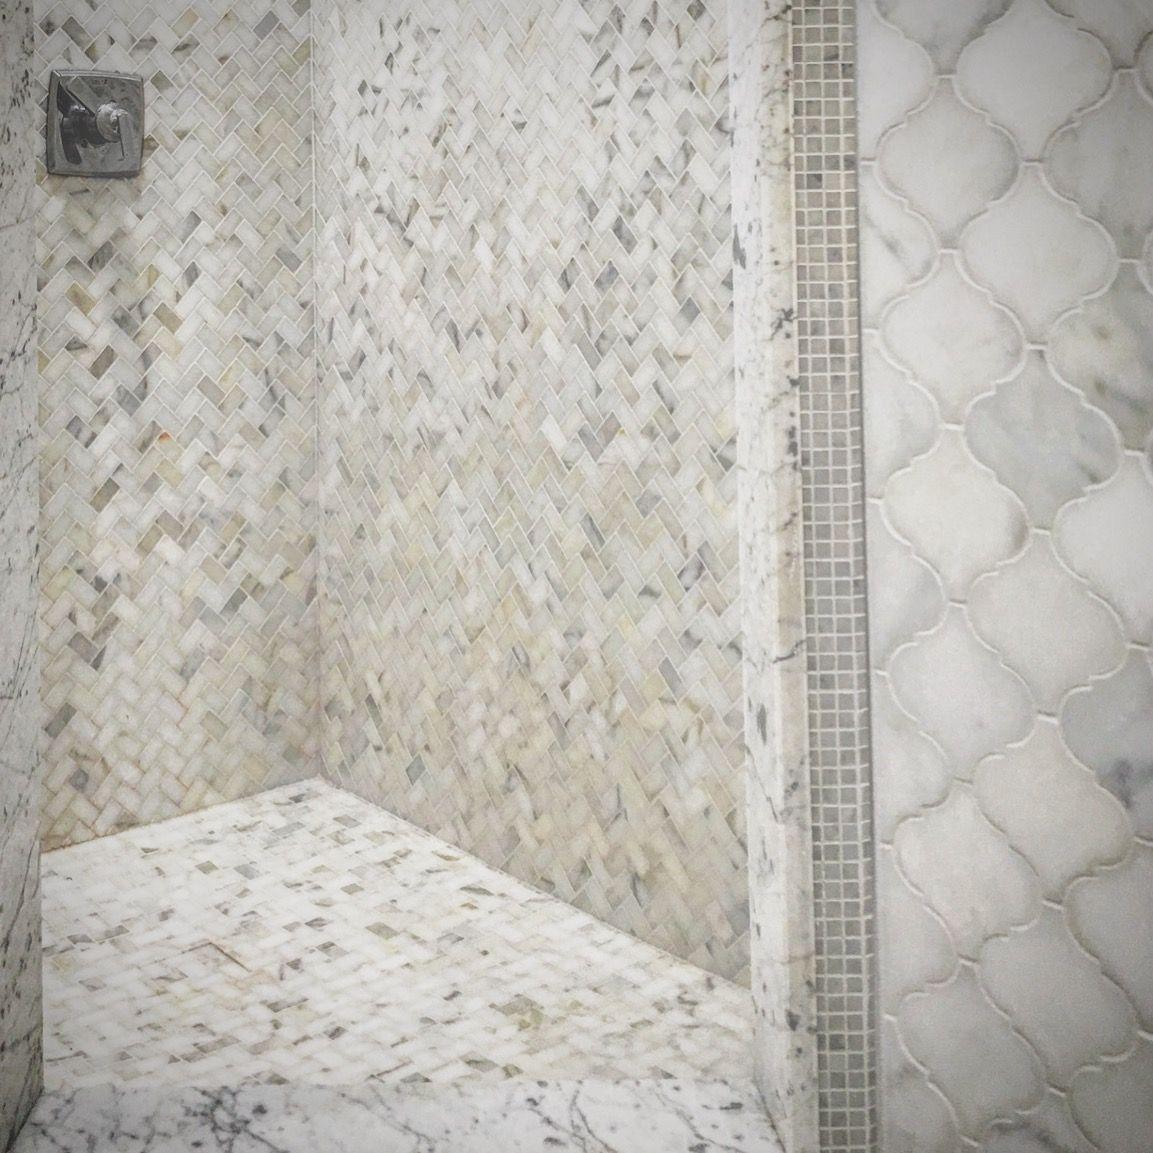 Shower Walls Calacatta Gold Marble 1 X2 Herringbone Mosaic Shower Floor Ca Herringbone Mosaic Tile Bathroom Mosaic Bathroom Tile Mosaic Tile Bathroom Floor